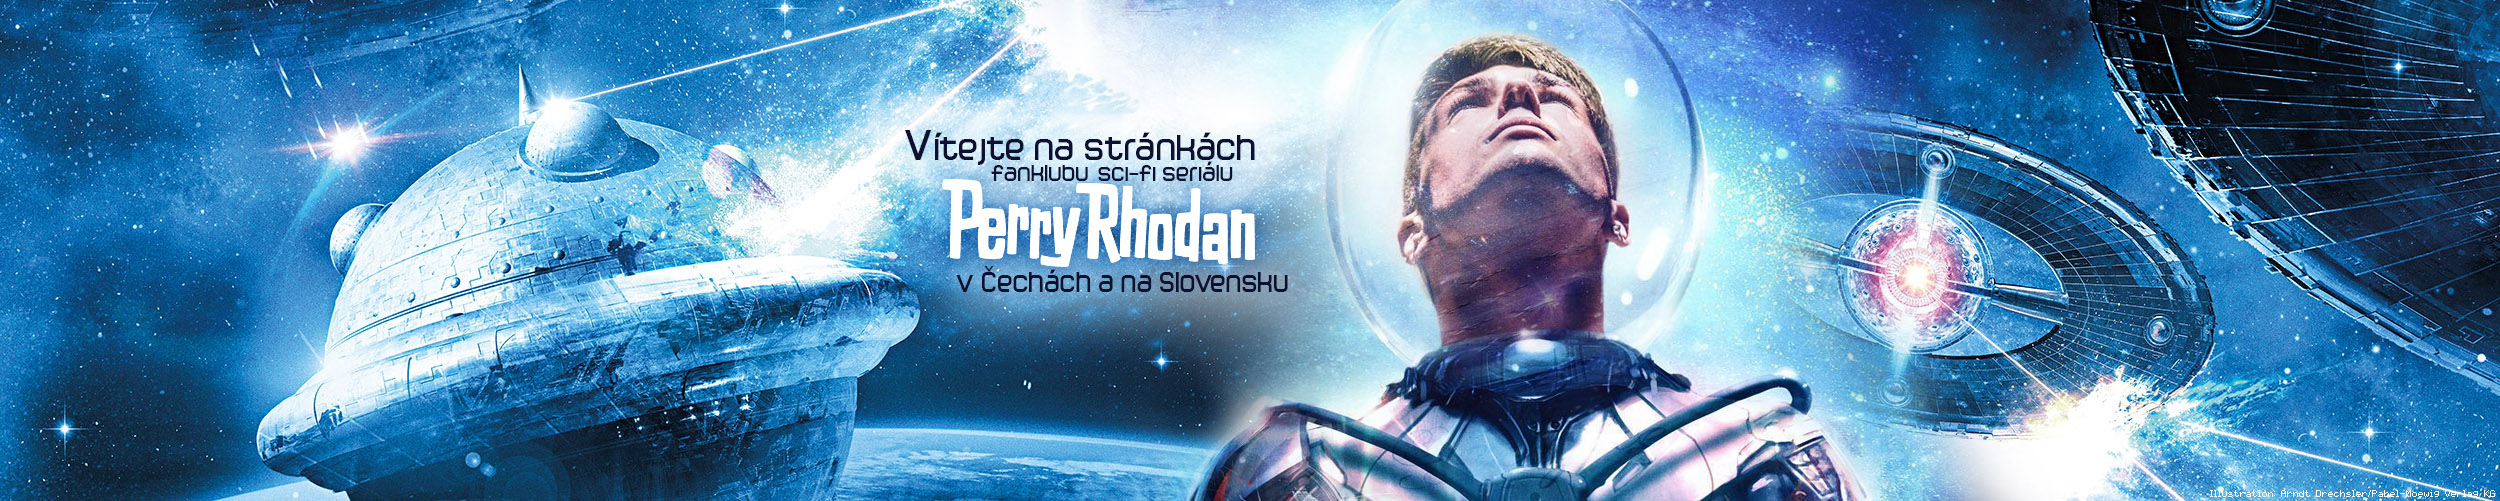 SFK Perry Rhodan